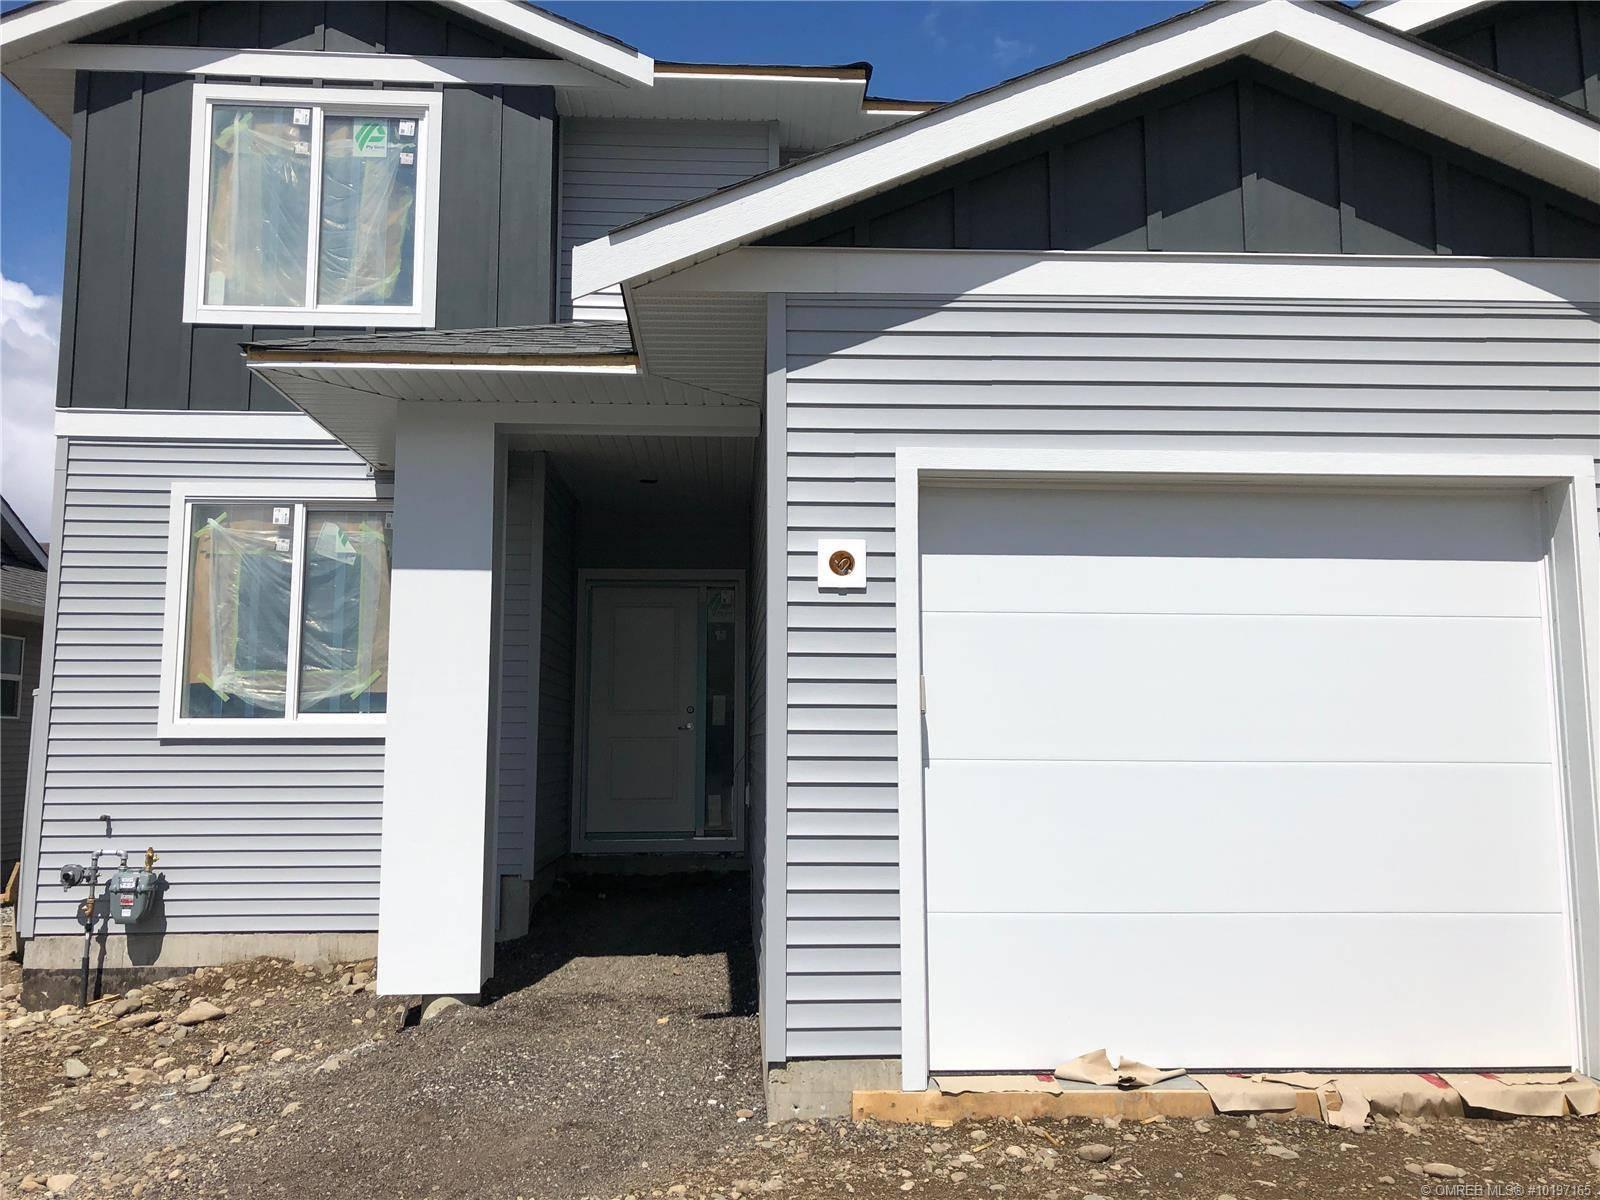 Townhouse for sale at 492 Sugars Ave Kelowna British Columbia - MLS: 10197165